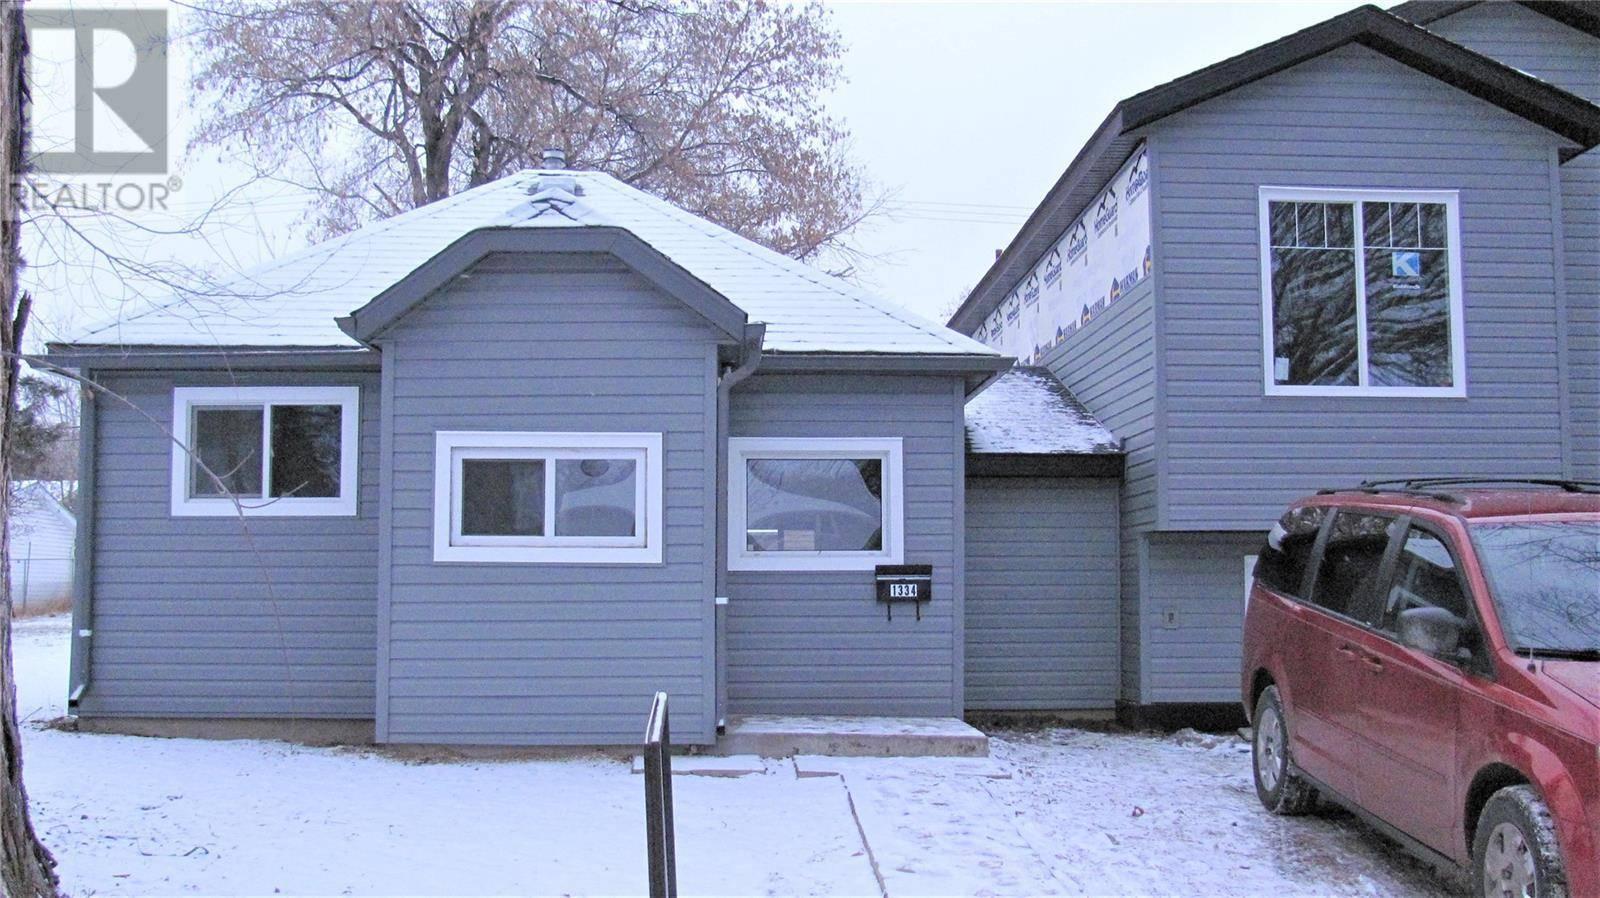 House for sale at 1334 I Ave N Saskatoon Saskatchewan - MLS: SK793398